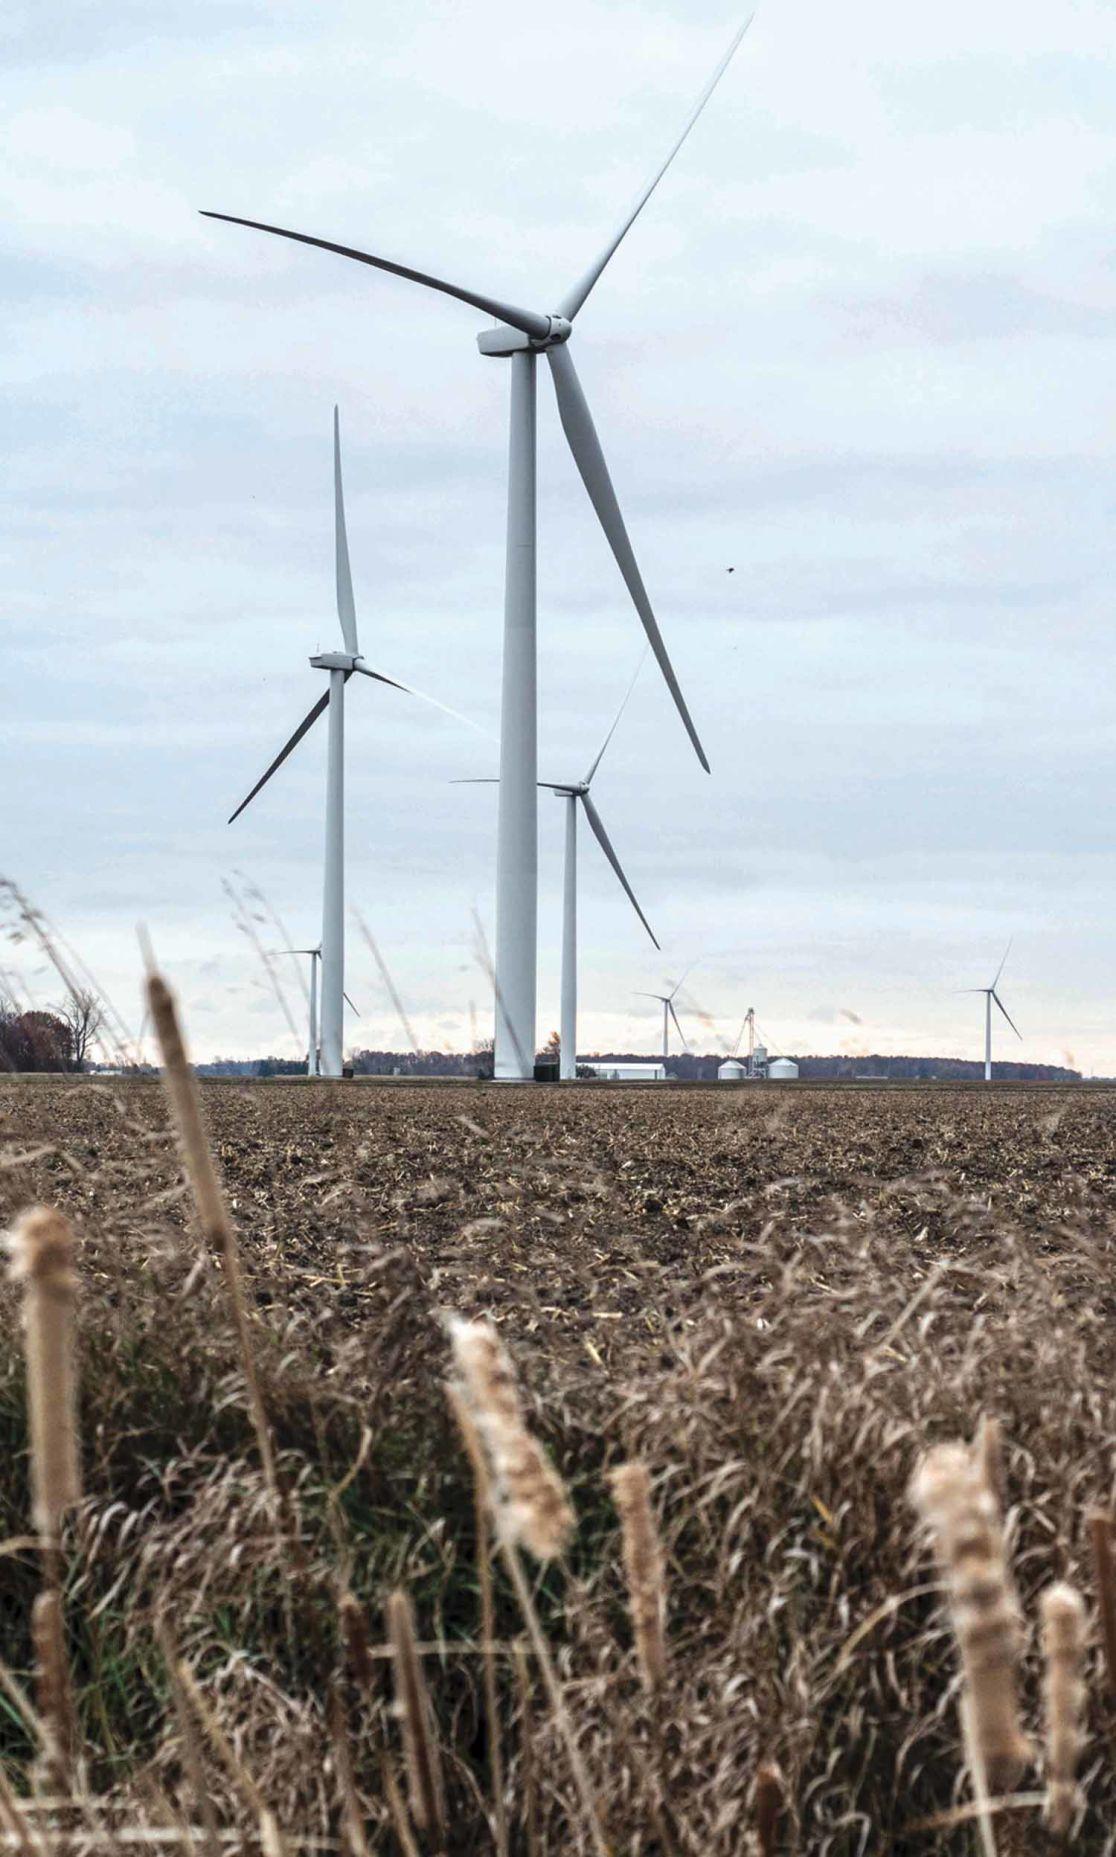 11-25_renewable energy1C_FILE PHOTO.jpg